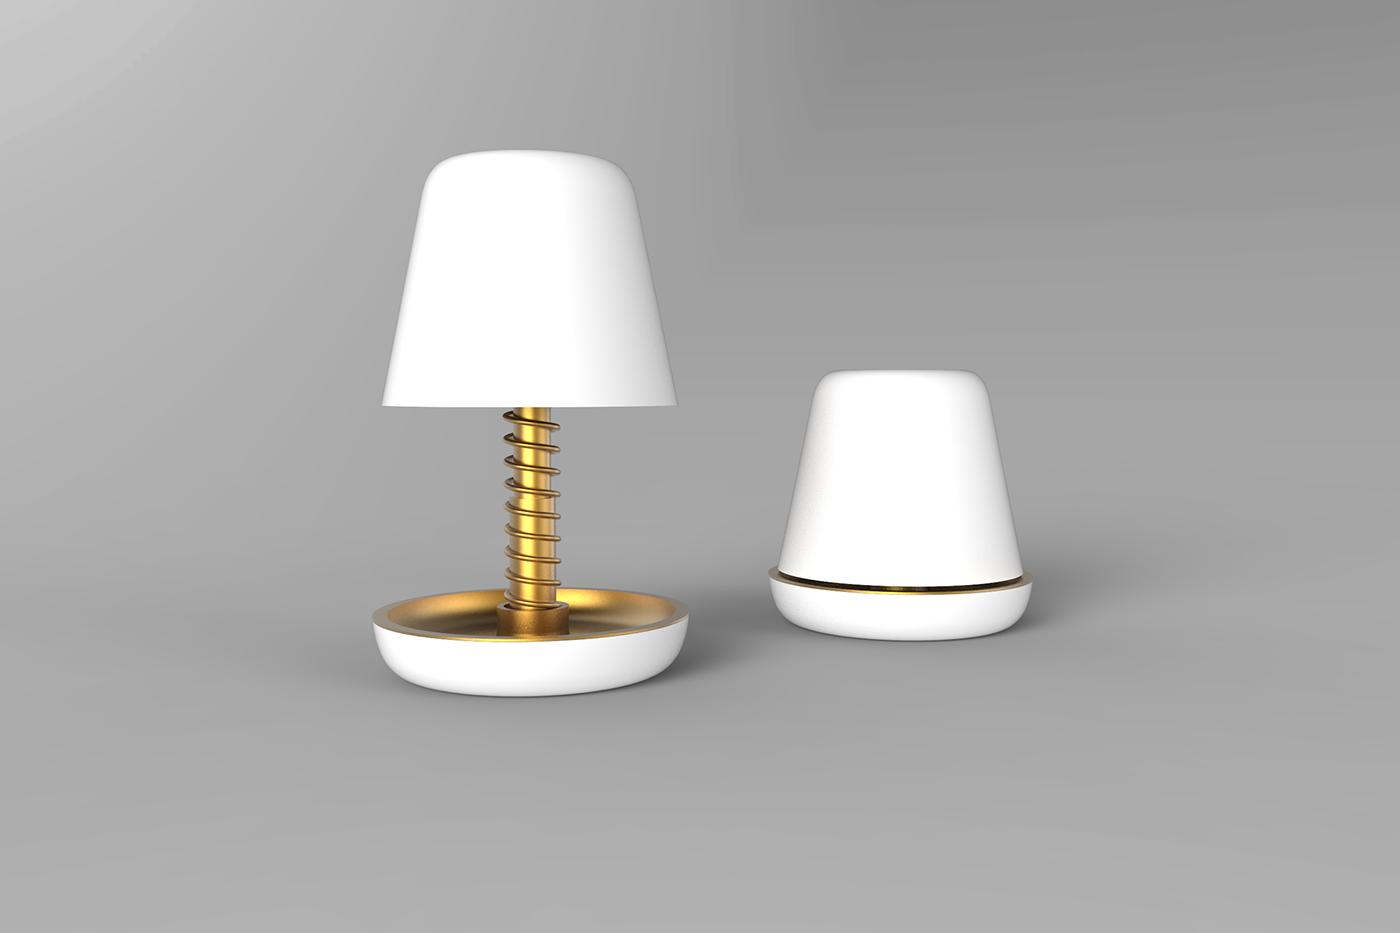 Renderings keyshot Lamp wake-up alarmclock gold White product design student